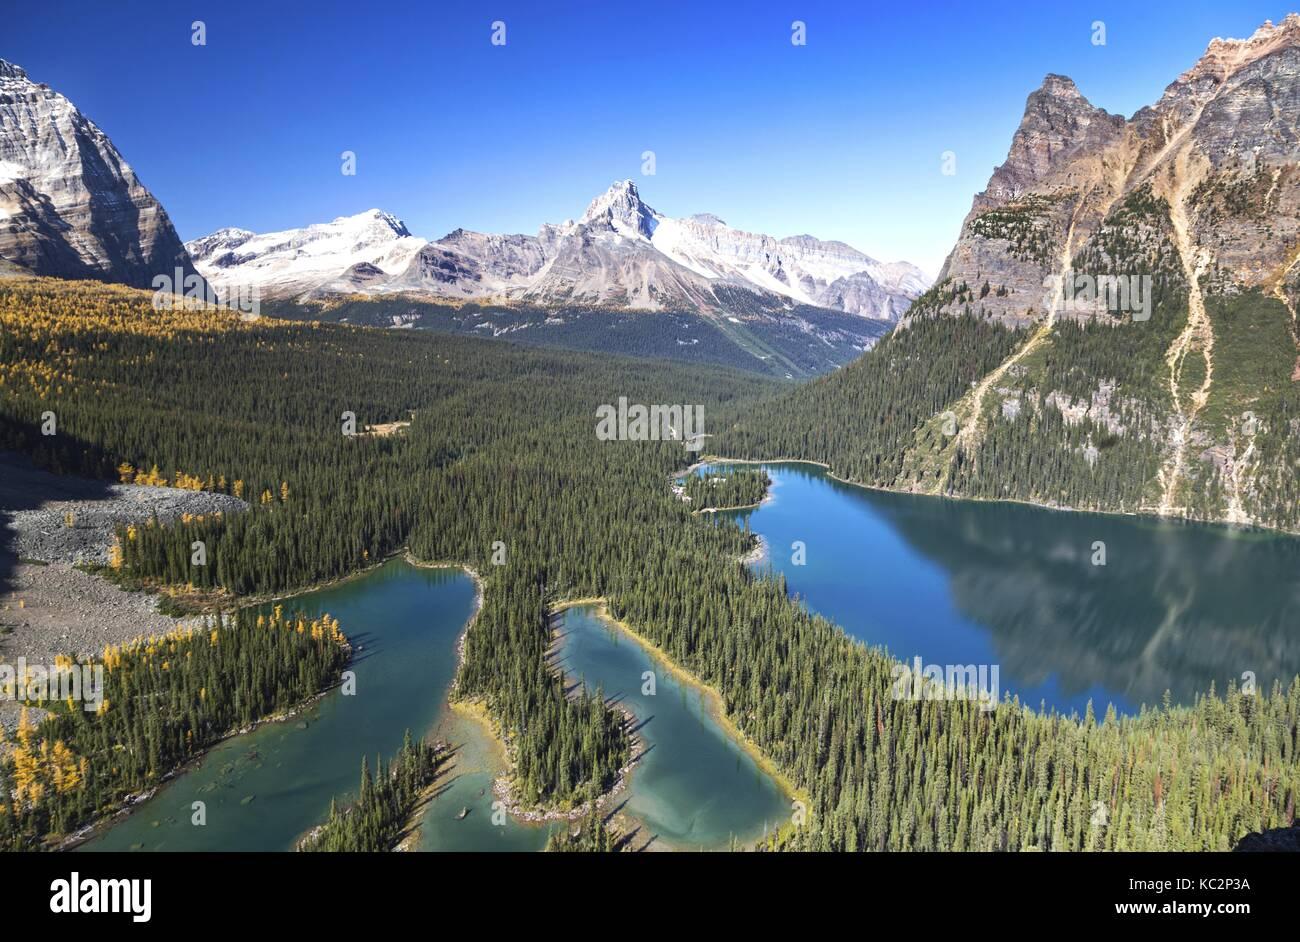 panoramic-landscape-view-of-lake-ohara-a